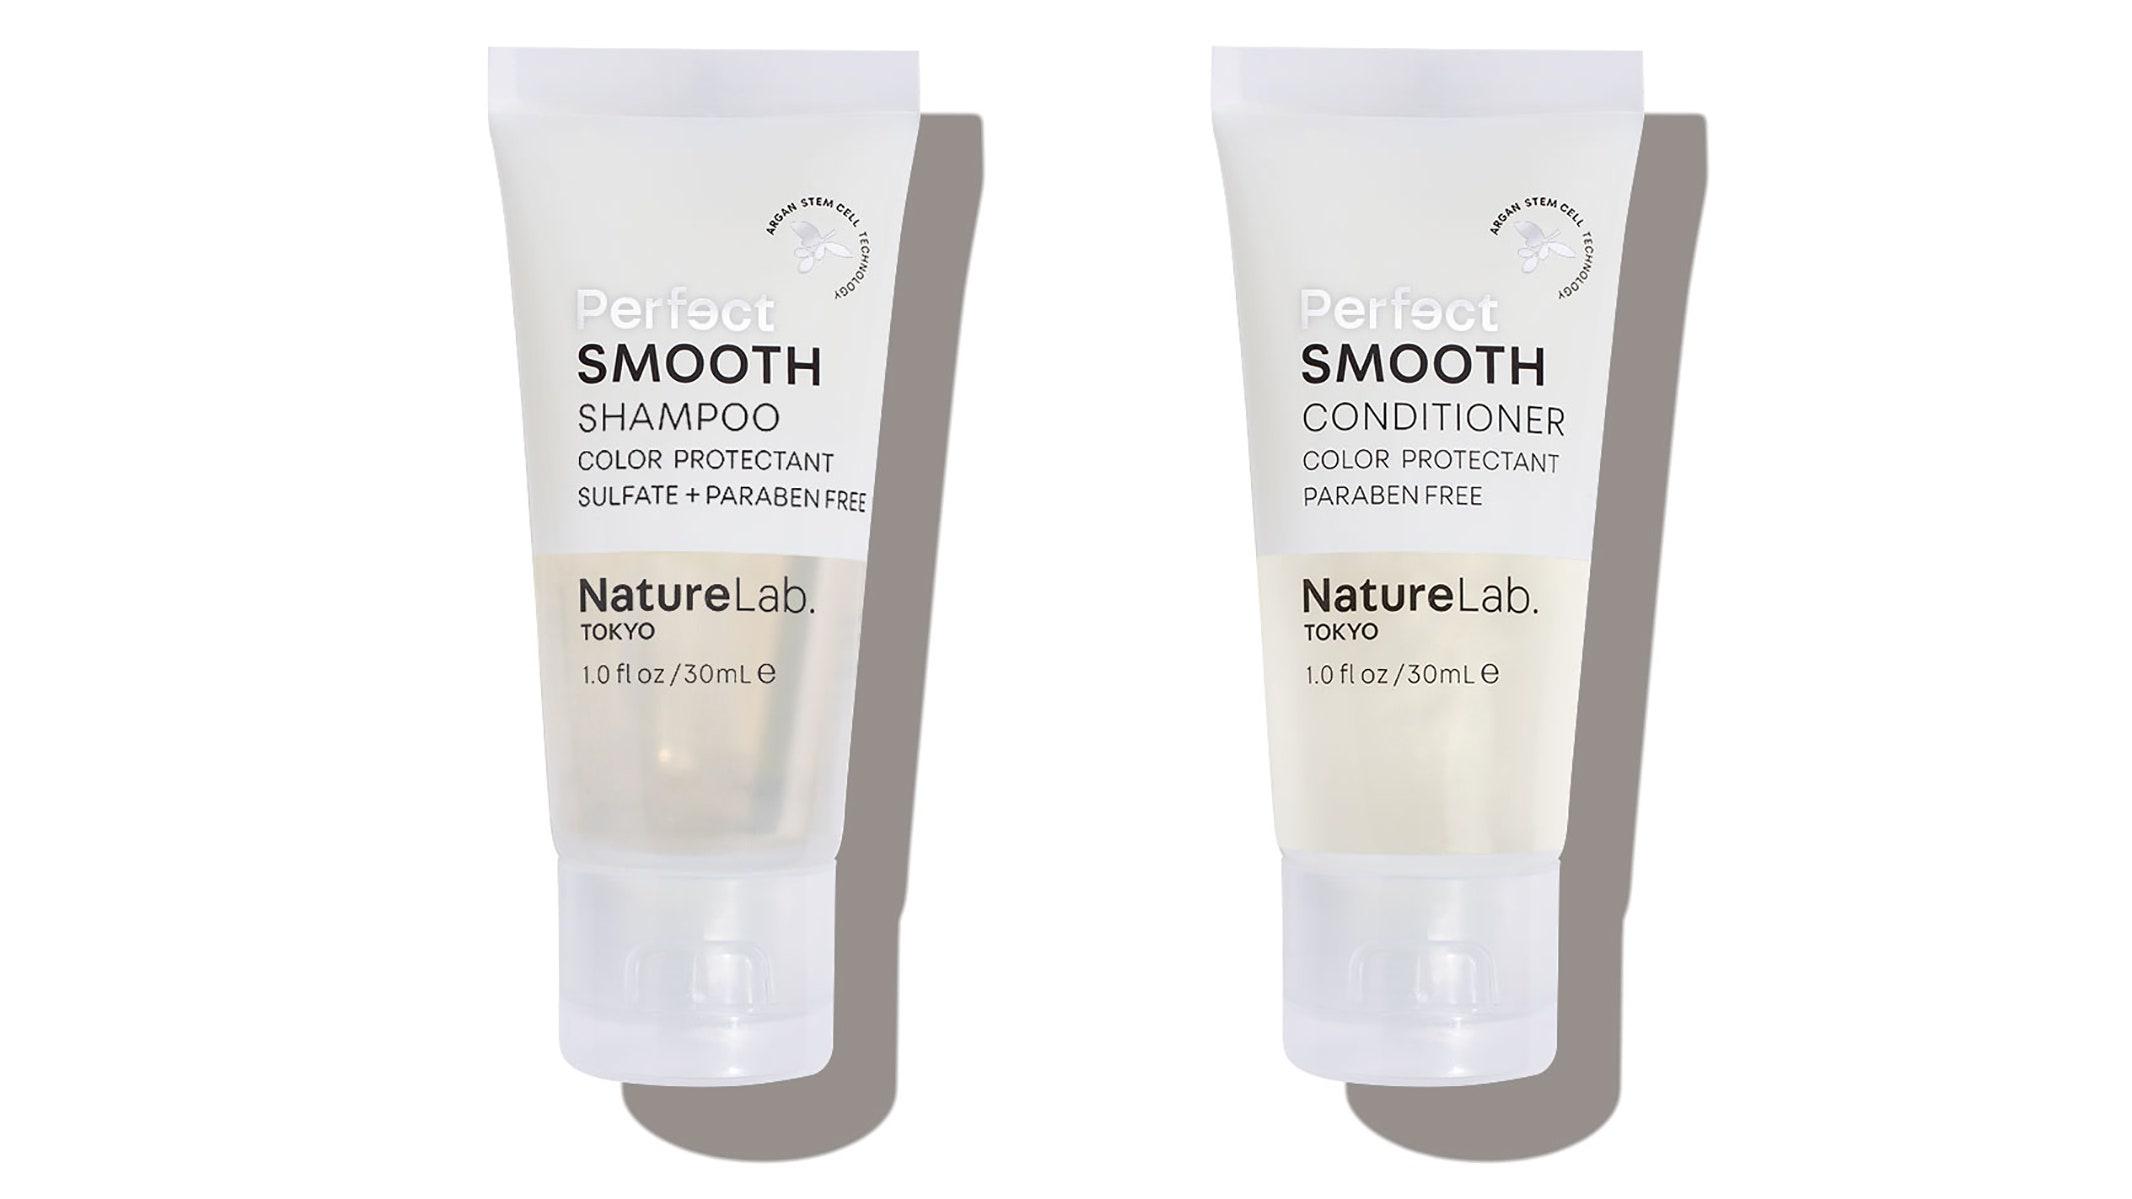 Naturelab - NatureLab Tokyo's Shampoo and Conditioner